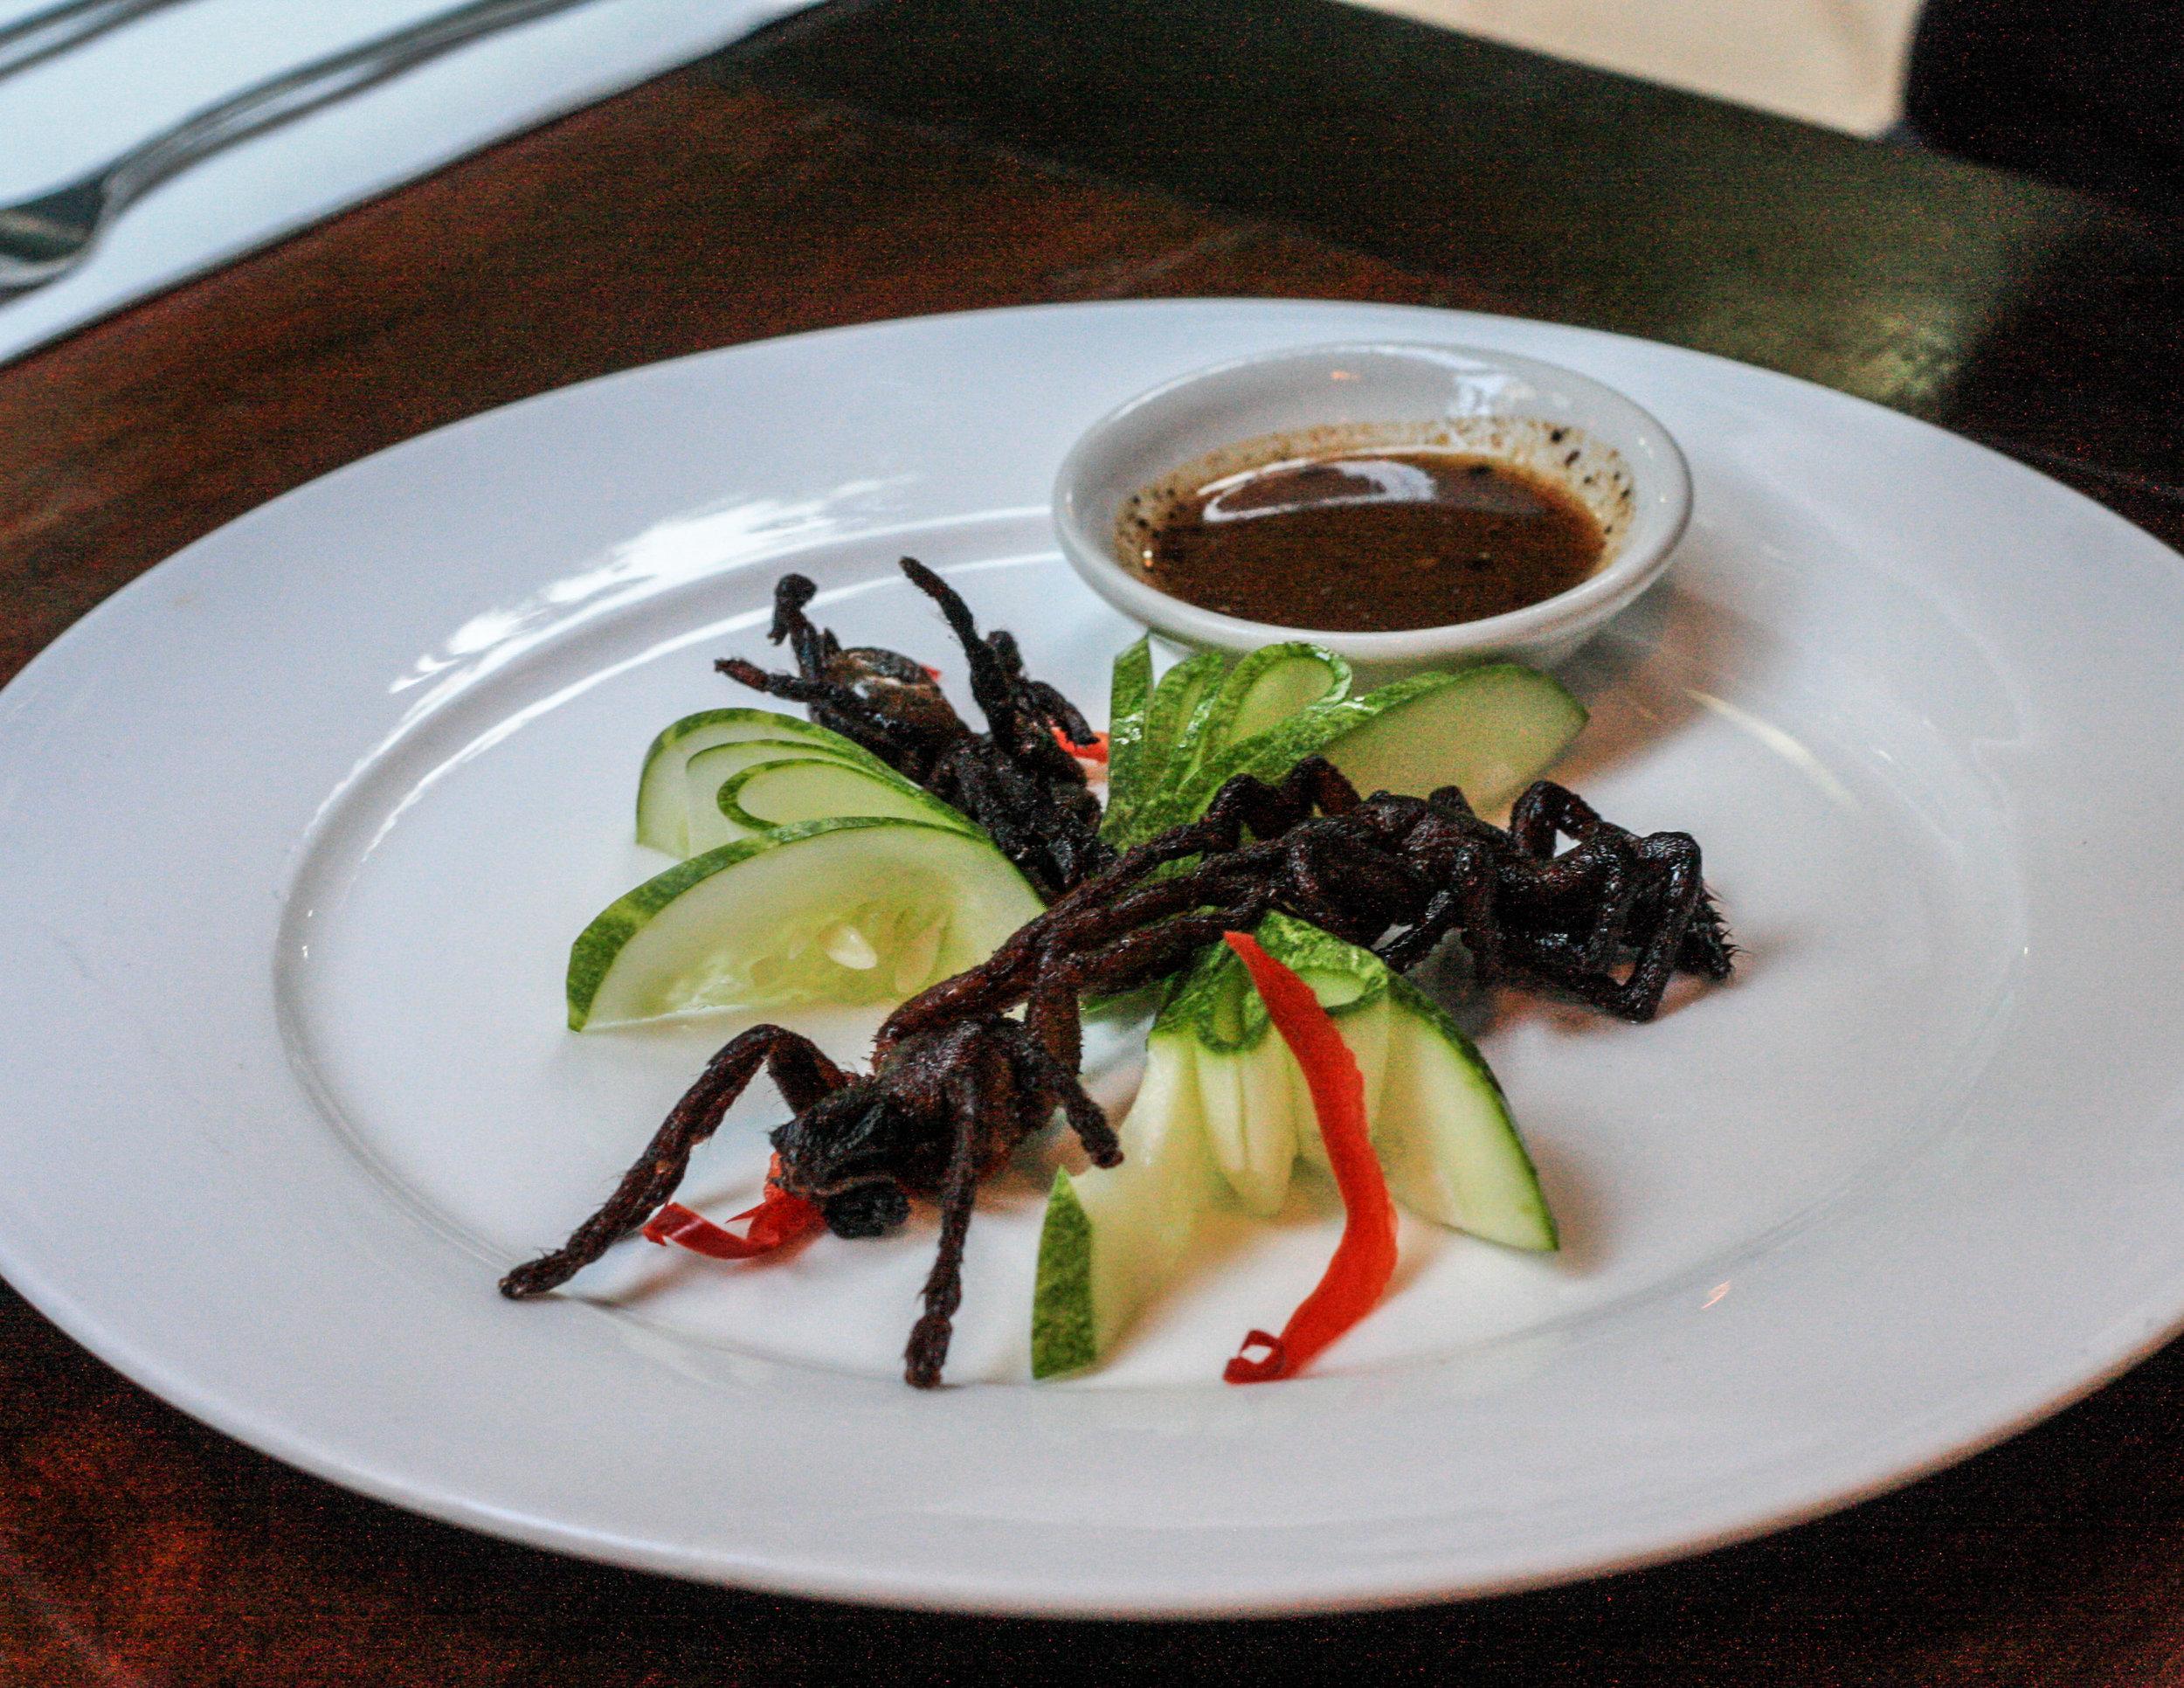 The food for the daring: deep-fried tarantula